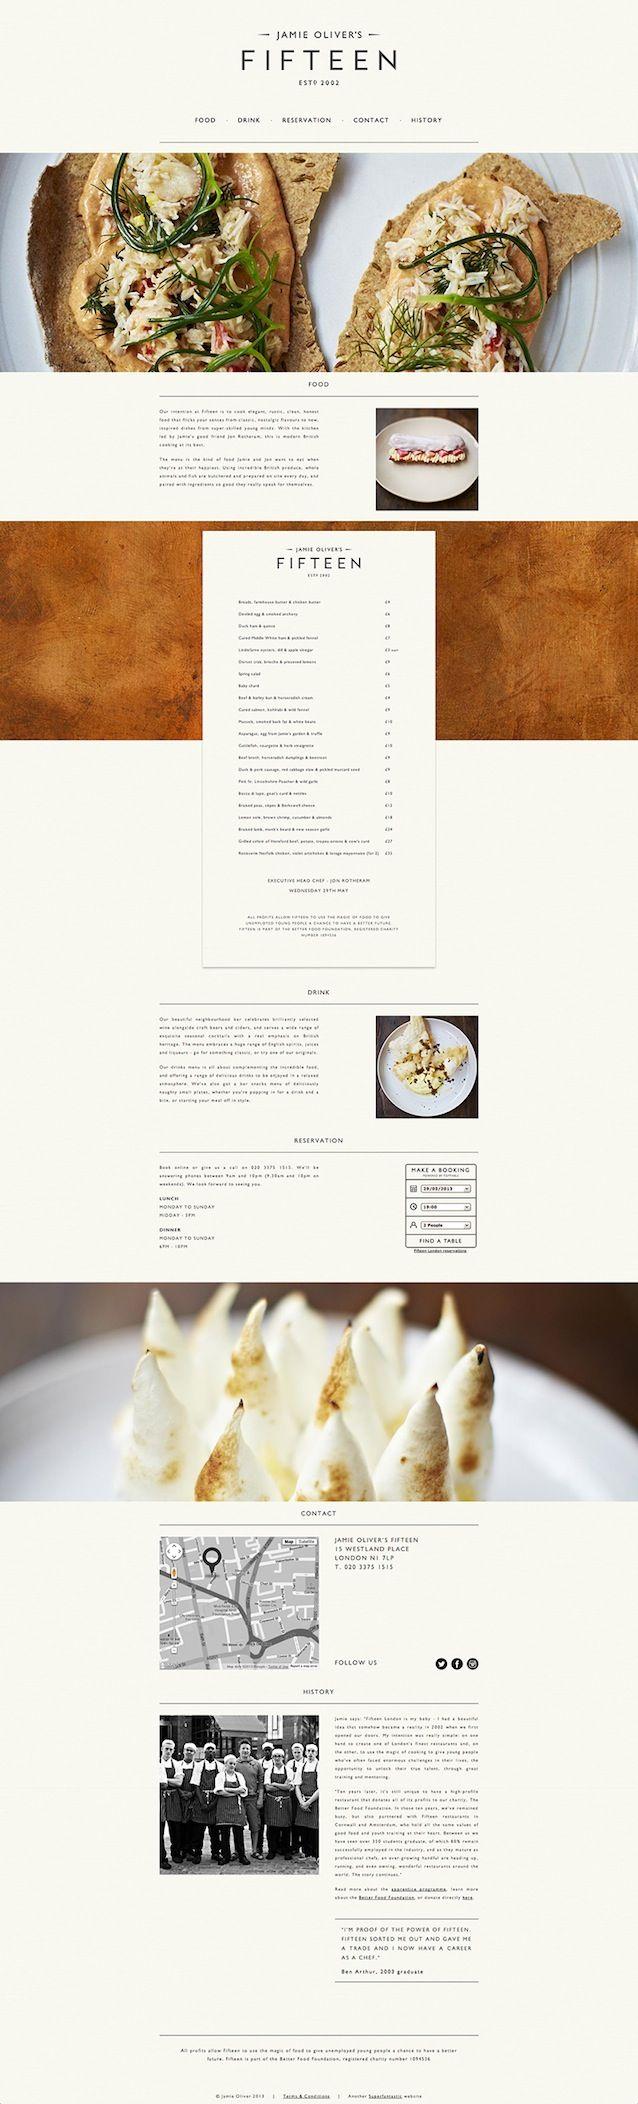 Jamie Oliver's 'Fifteen' website design with parrallax | #website #design #parrallax | http://www.rubbercheese.com/blog